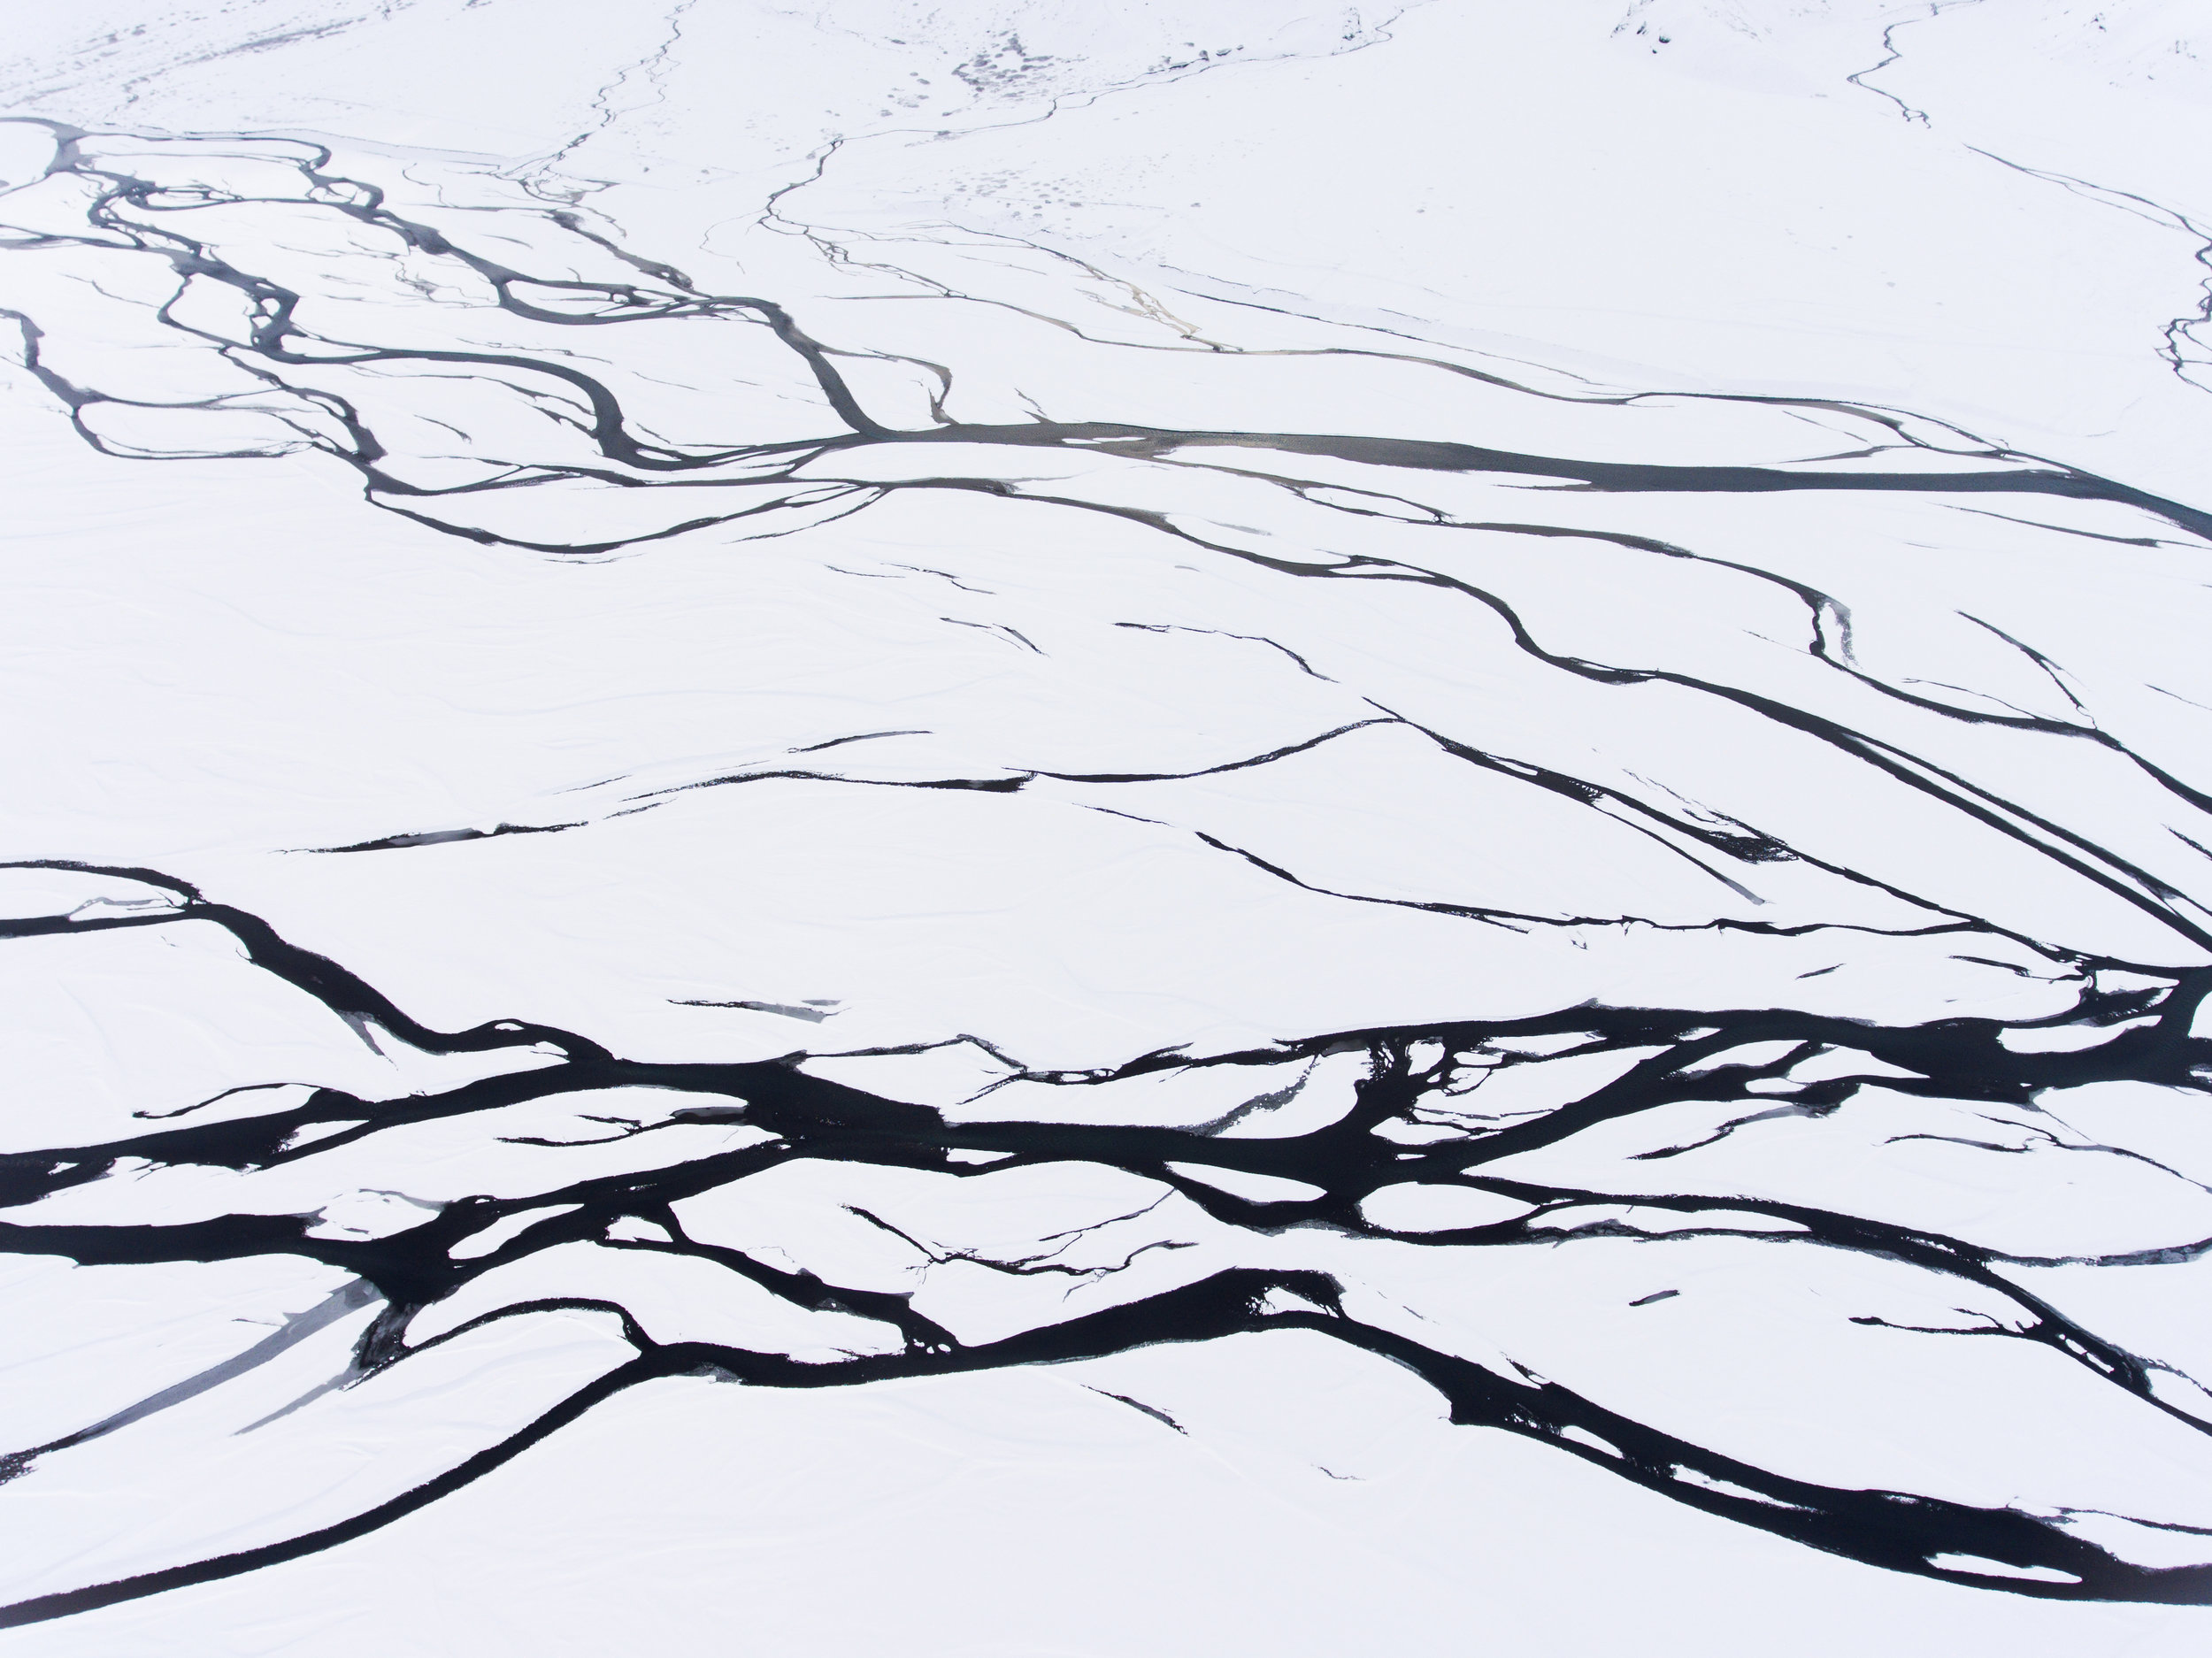 jermiah-schuster-iceland-376.jpg